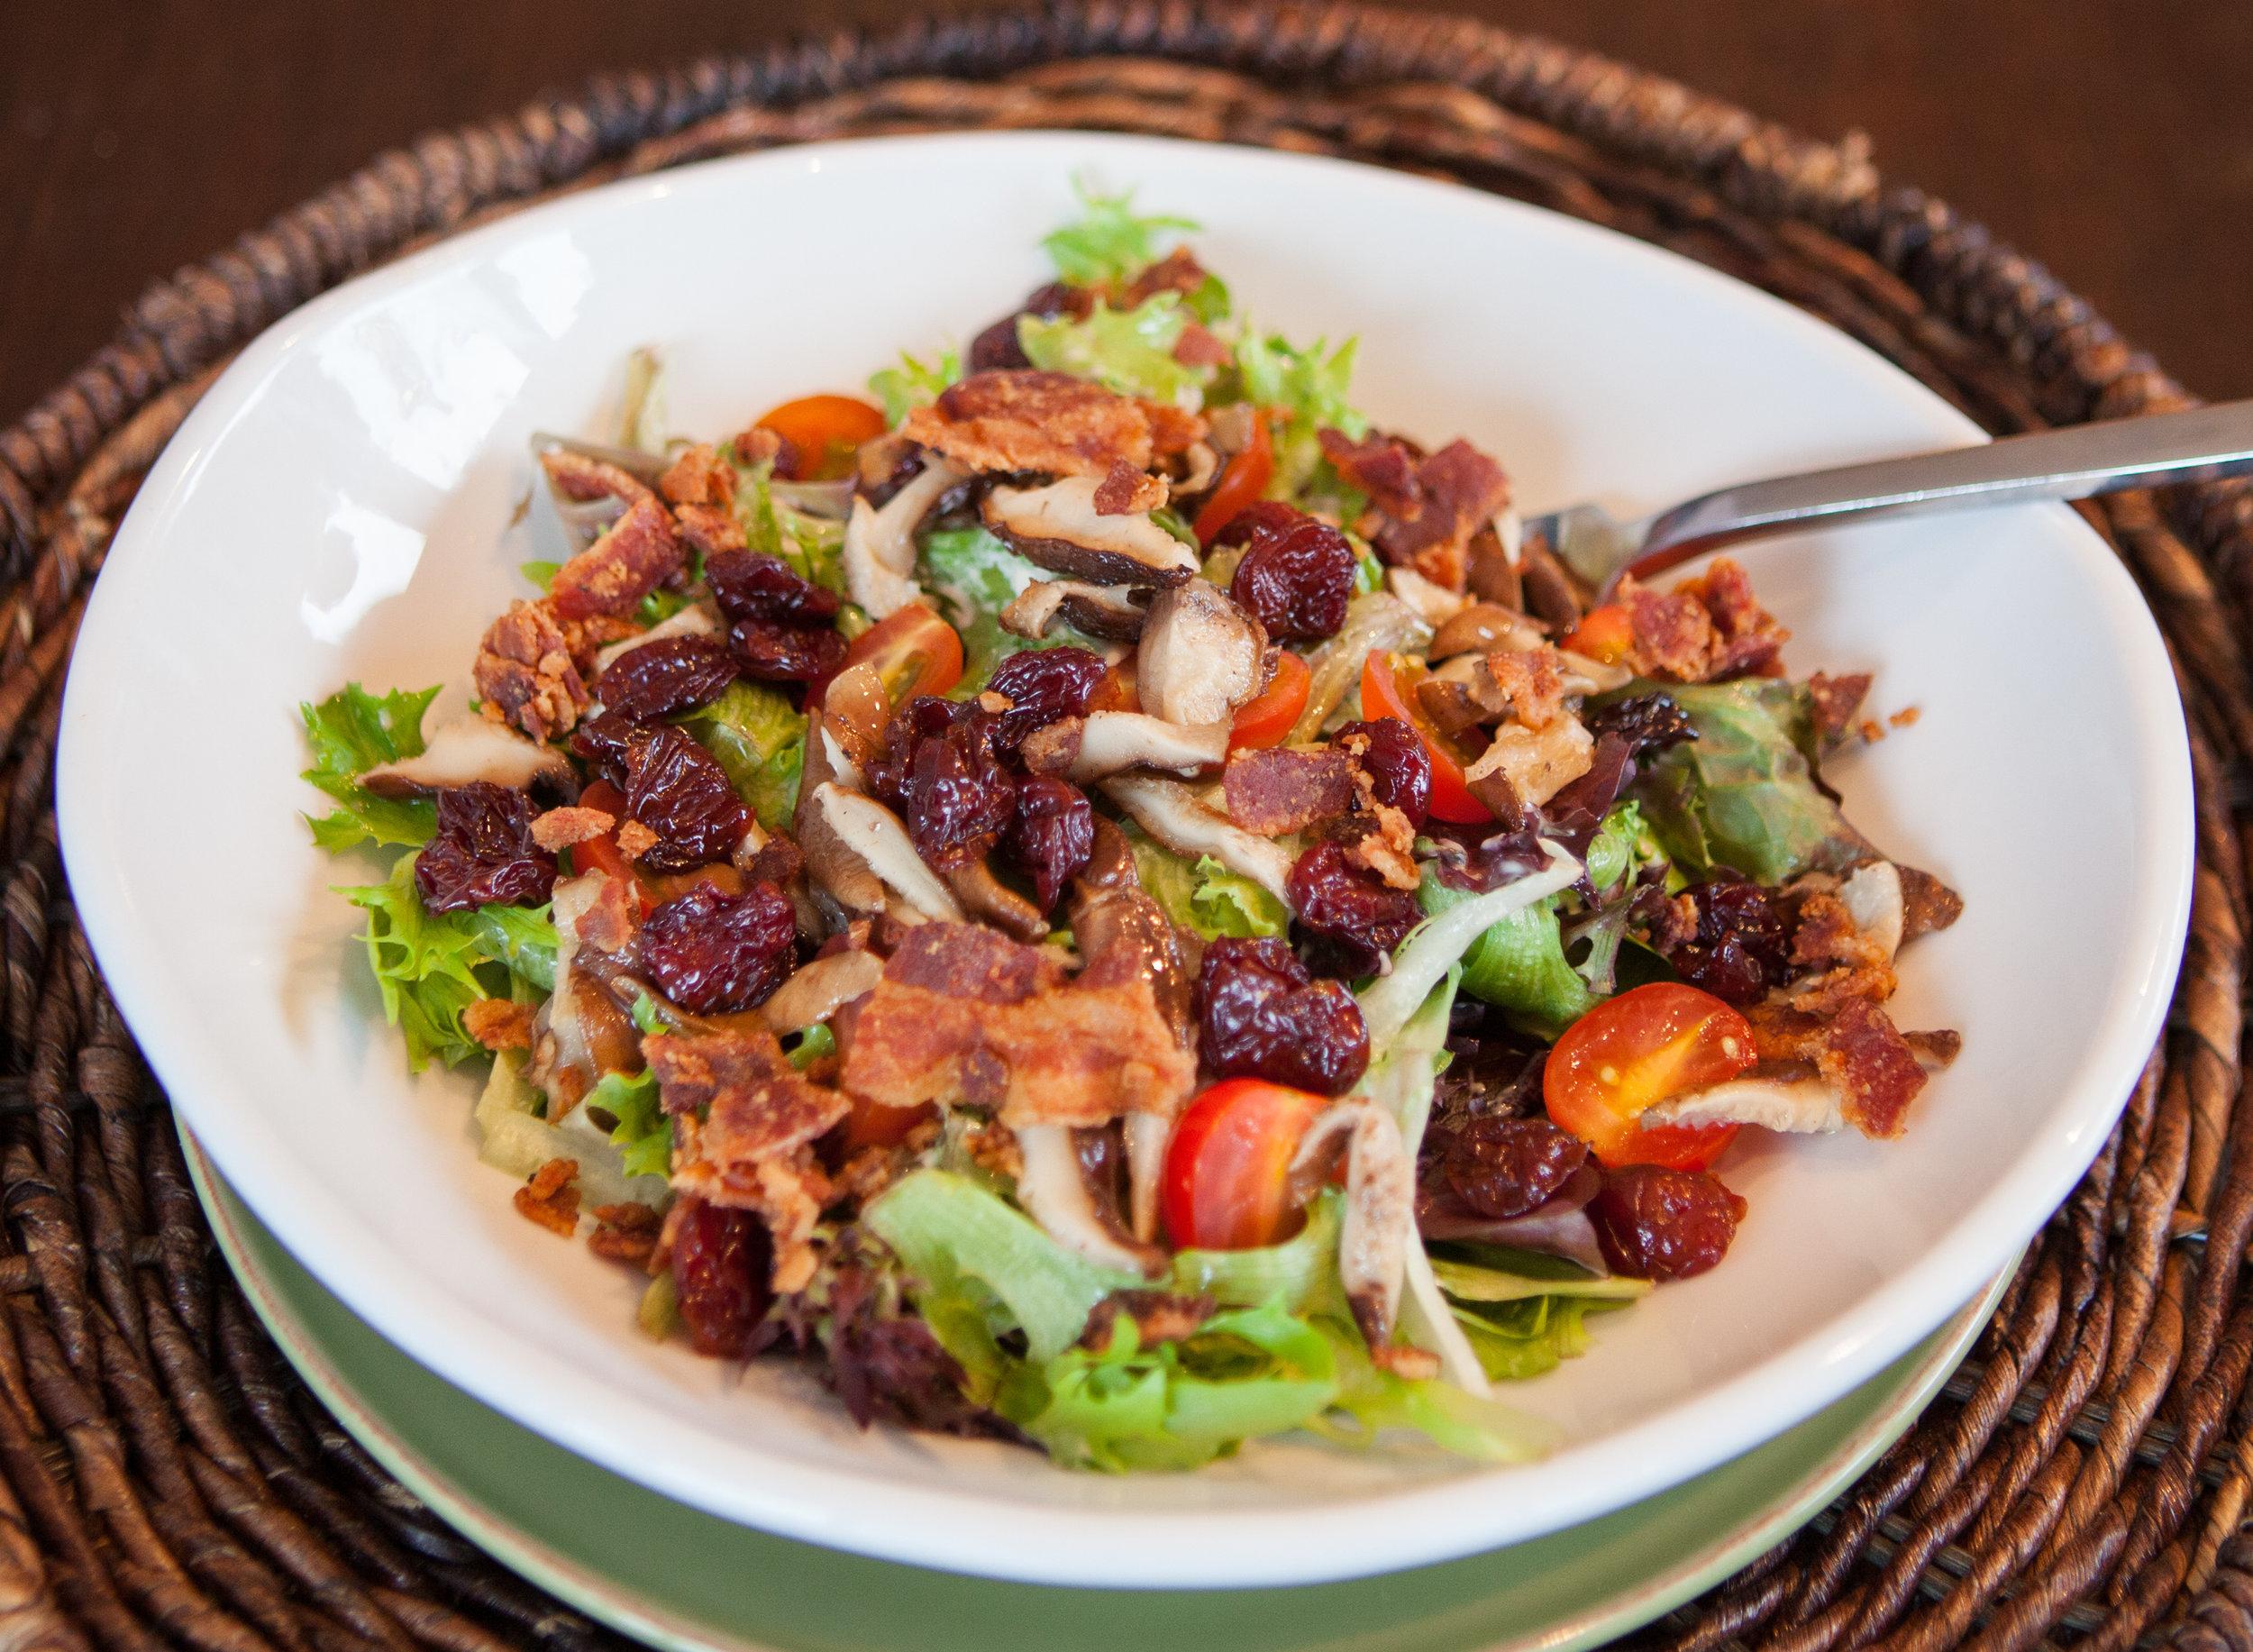 Houcks Salad 7644_edited-11x15 B.jpg